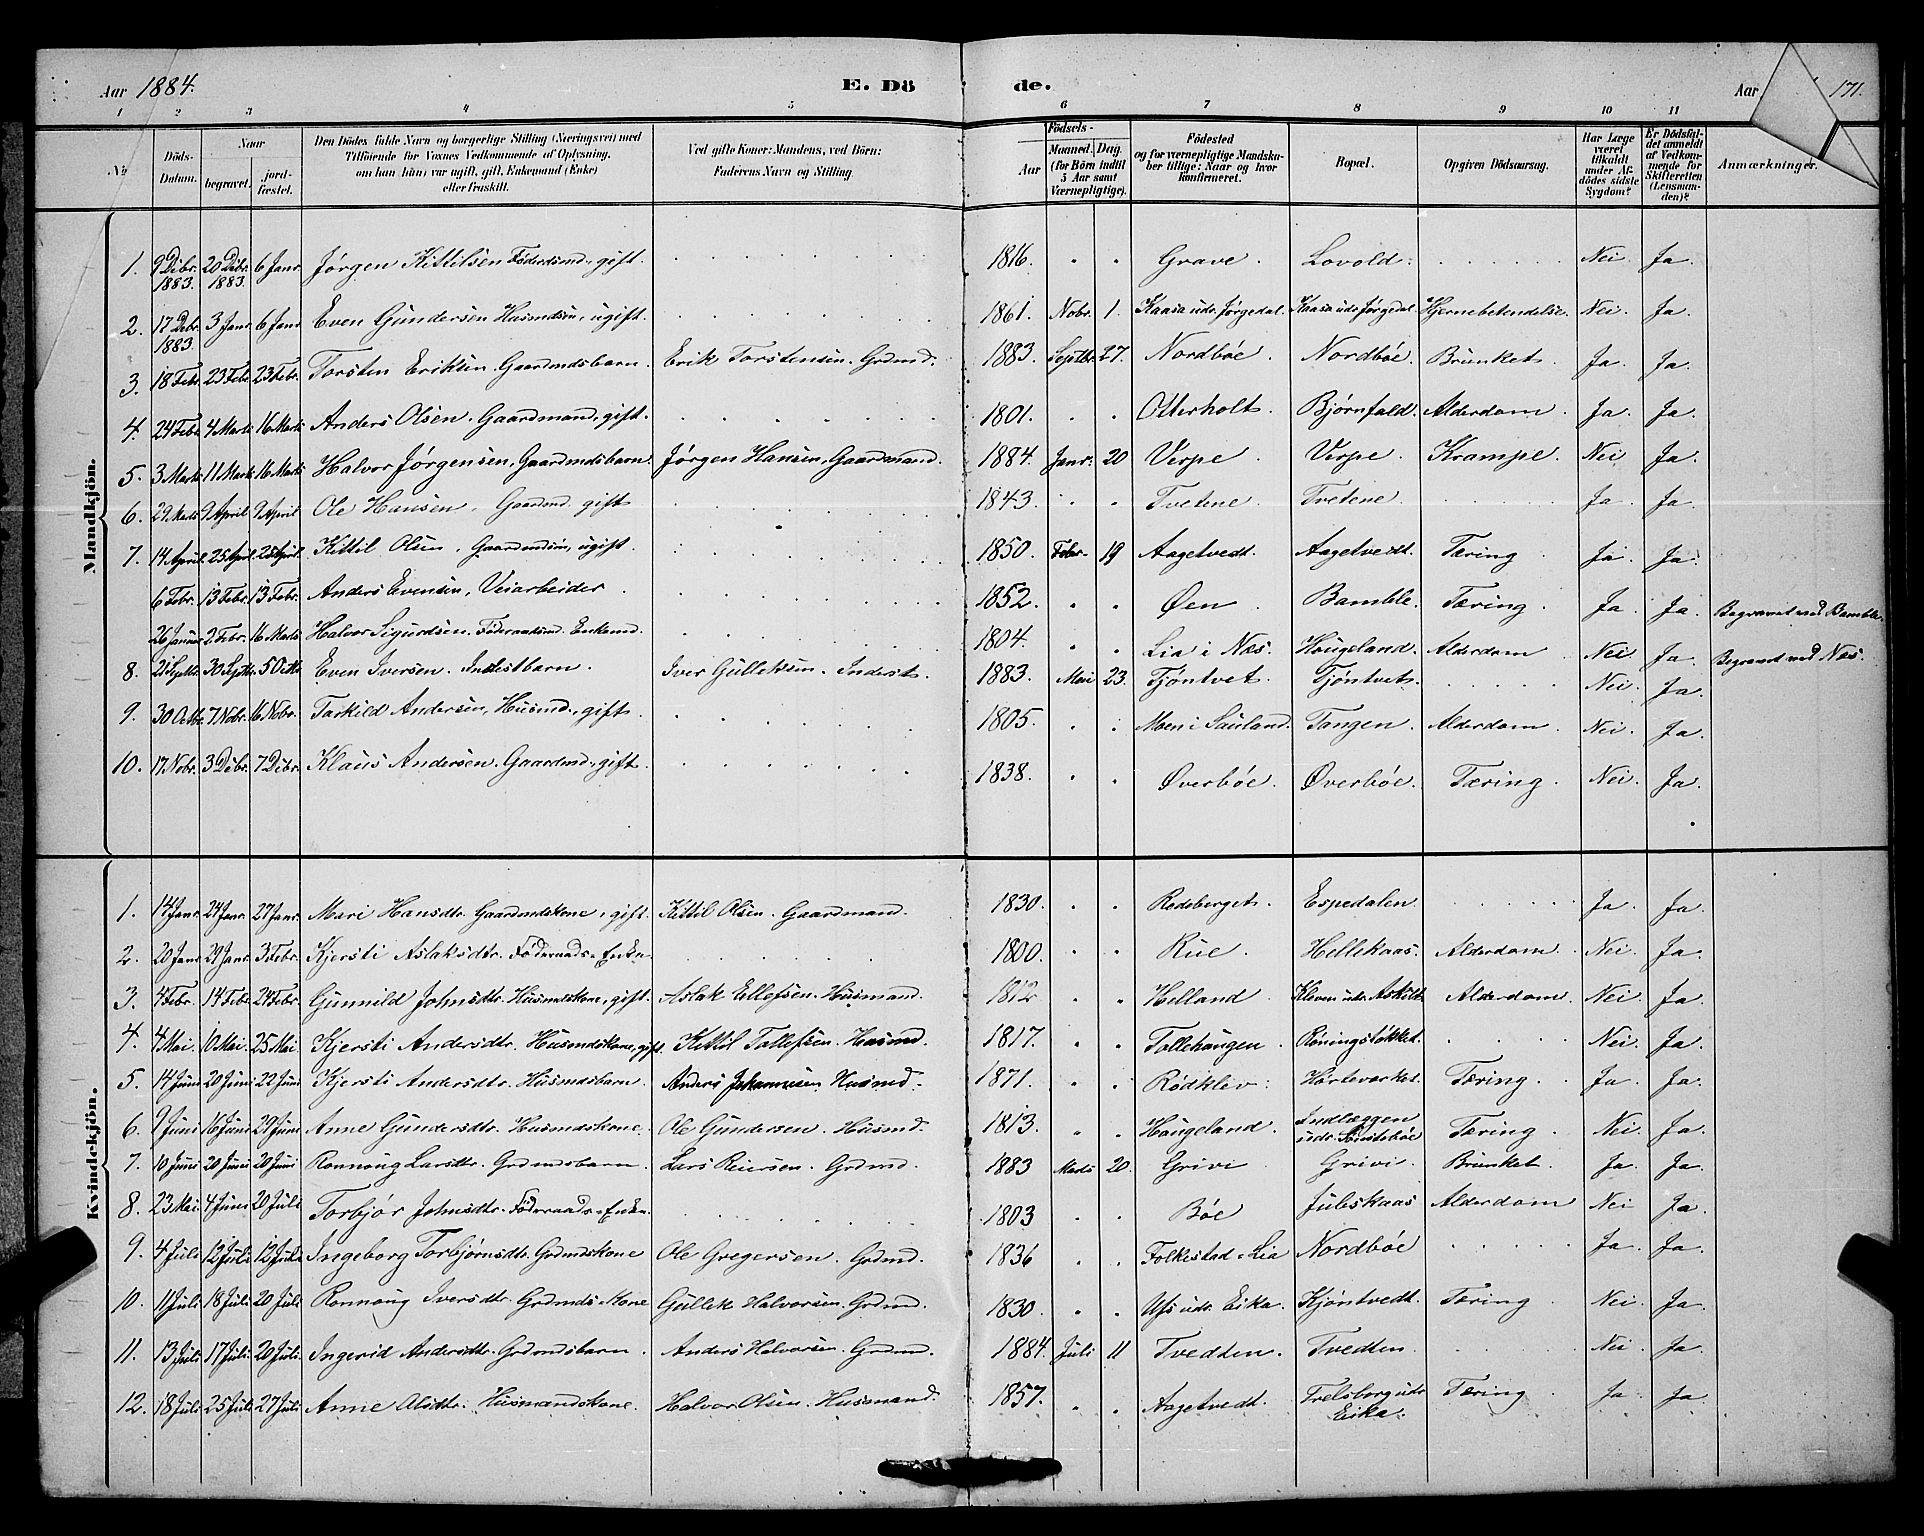 SAKO, Bø kirkebøker, G/Ga/L0005: Klokkerbok nr. 5, 1883-1897, s. 170